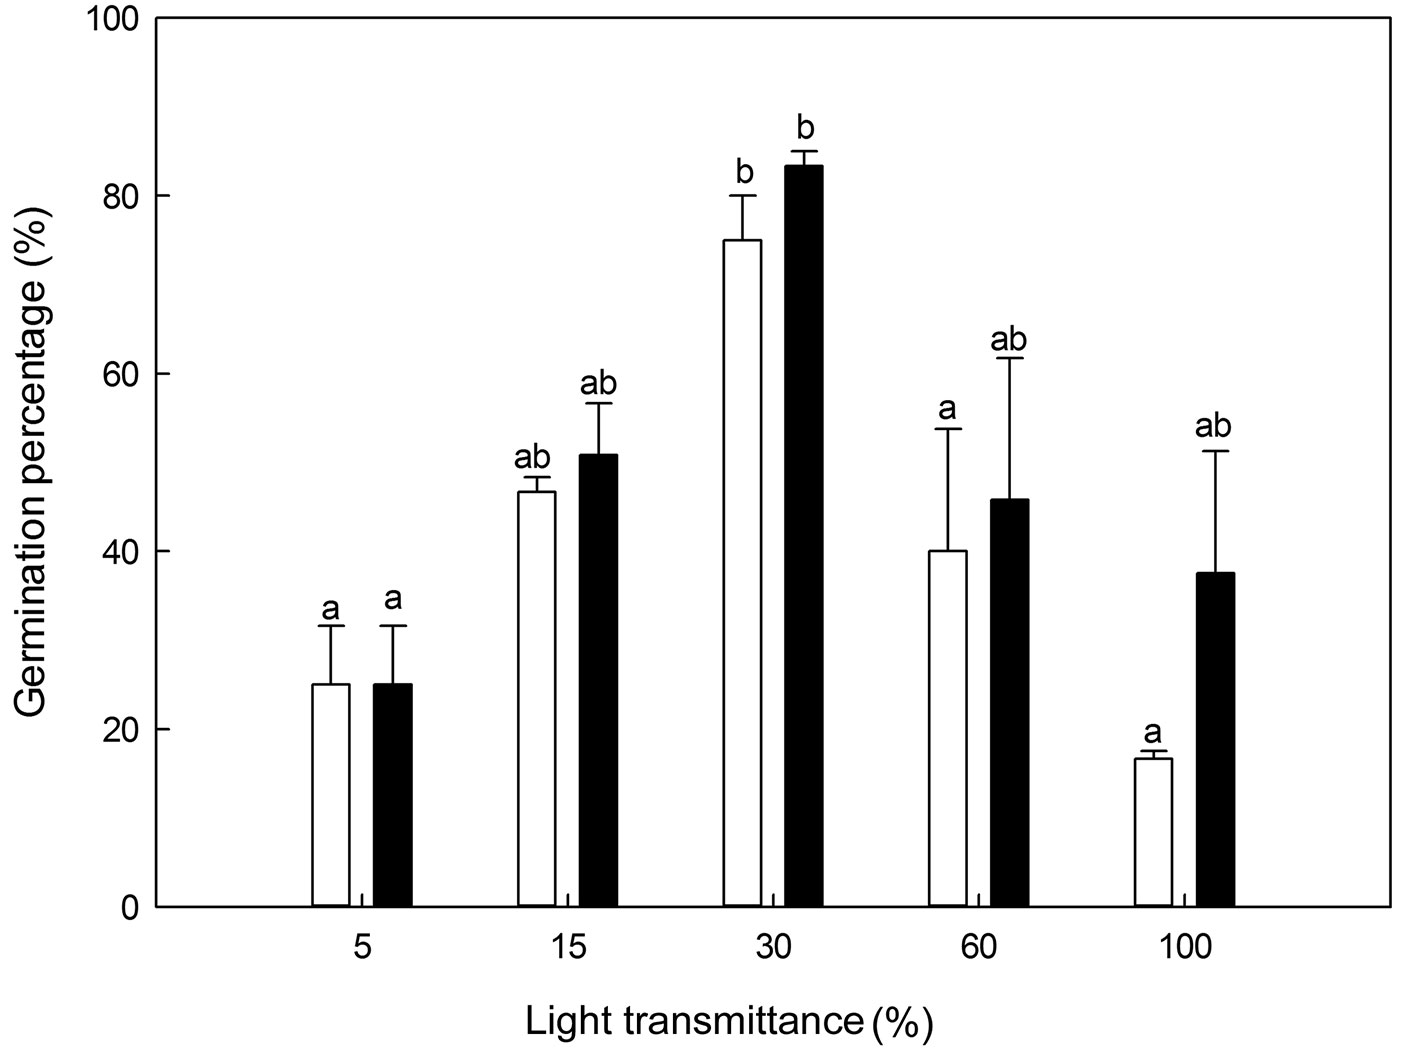 Zhang M Yan Q Zhu J 2015 Optimum Light Transmittance For Seed Germination Diagram Fig 4